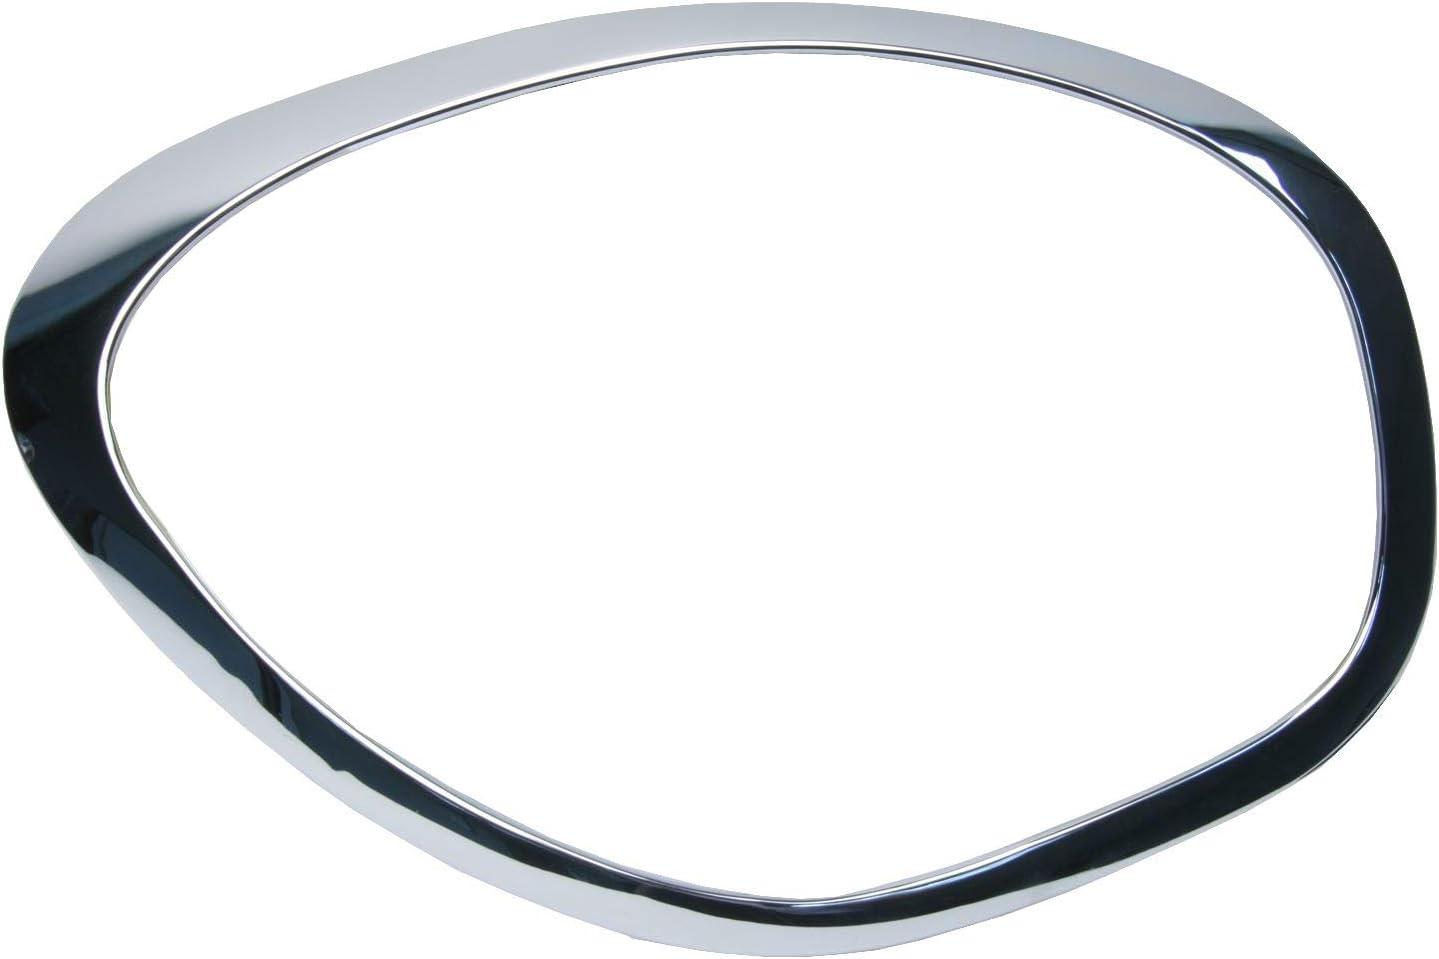 Chrome Left URO Parts 51139813823 Headlight Trim Ring